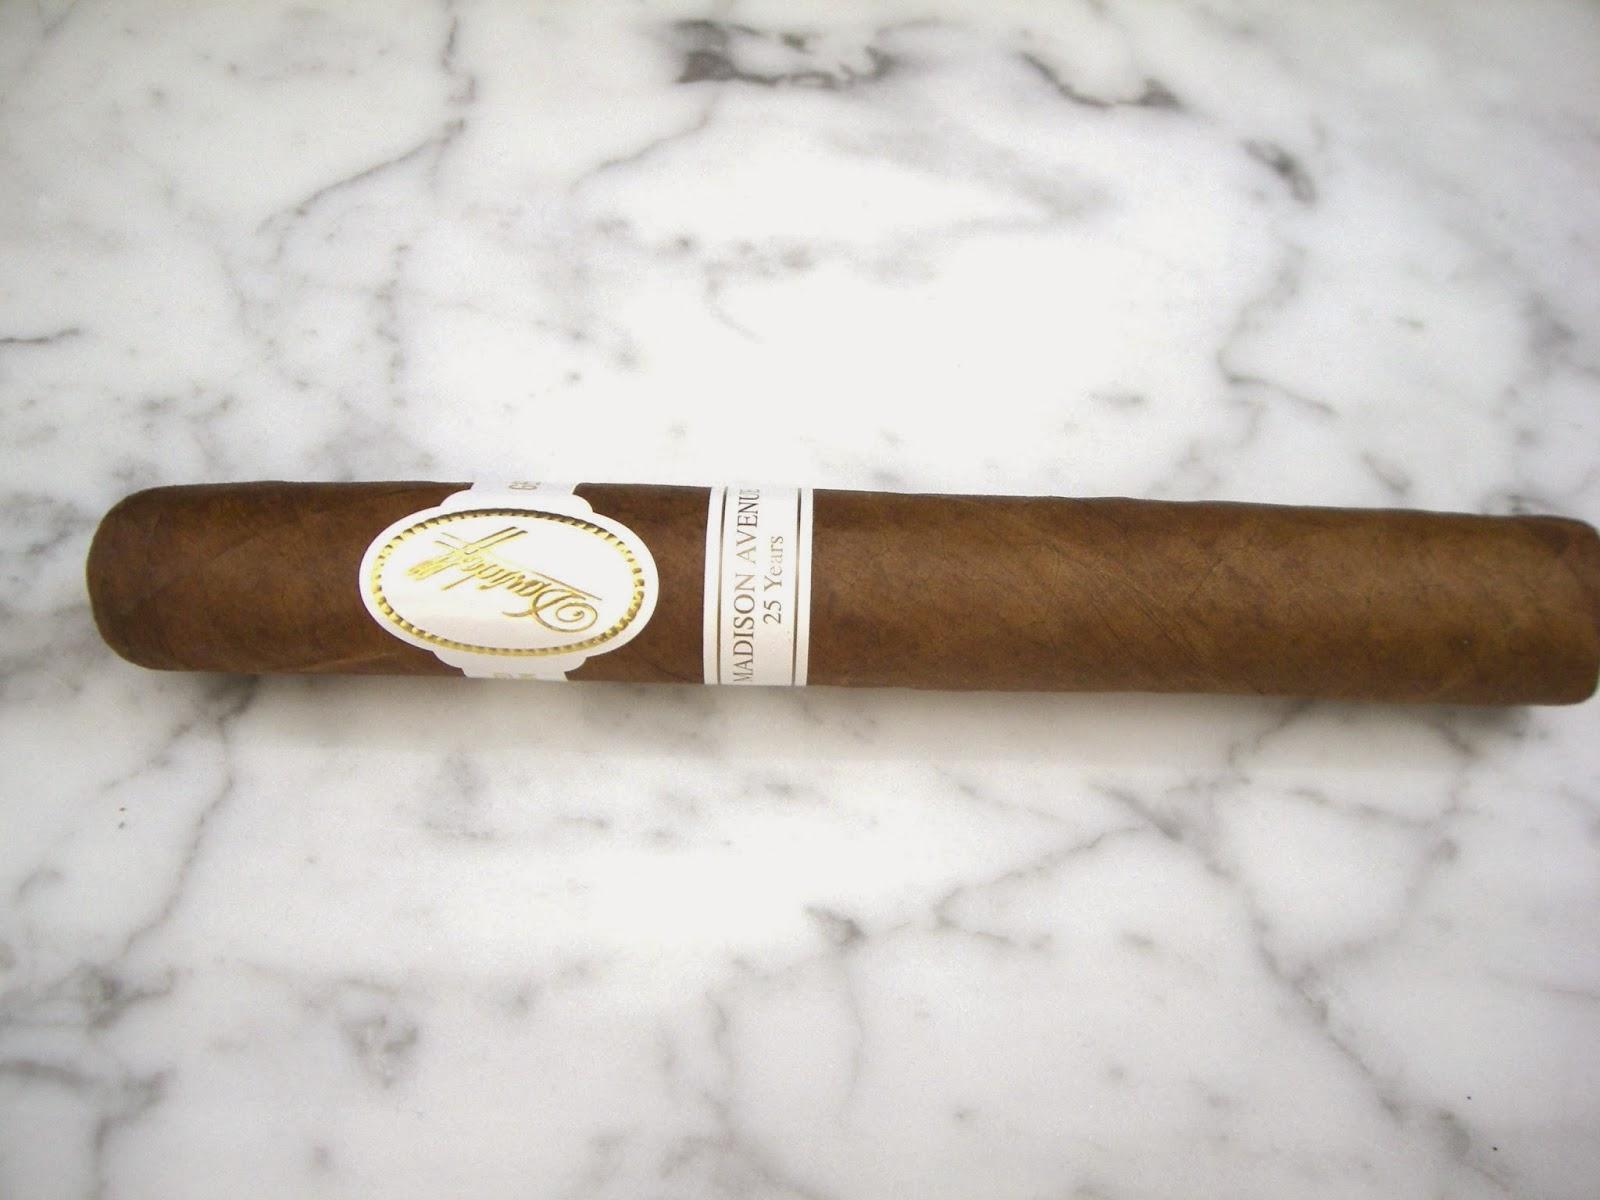 Cigar Review: Davidoff Madison Avenue 25th Anniversary